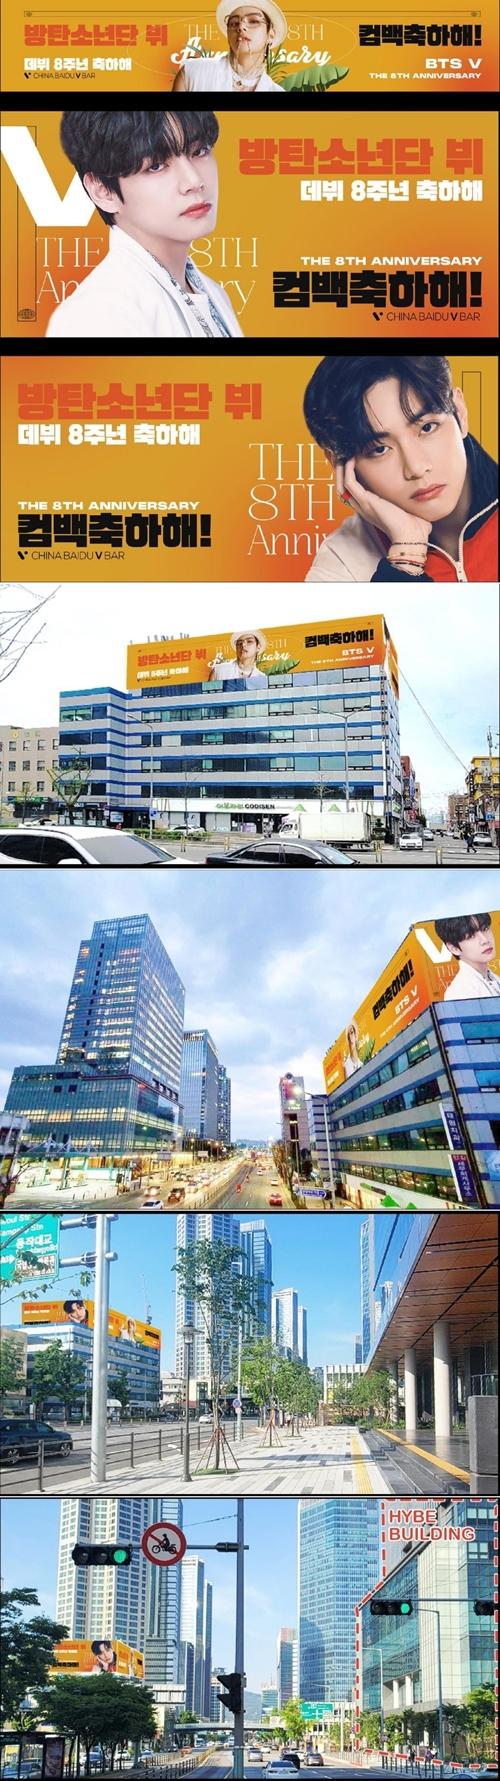 「BTS(防弾少年団)」Vへのカムバック&デビュー8周年記念サポートが話題…巨大広告を事務所前に設置